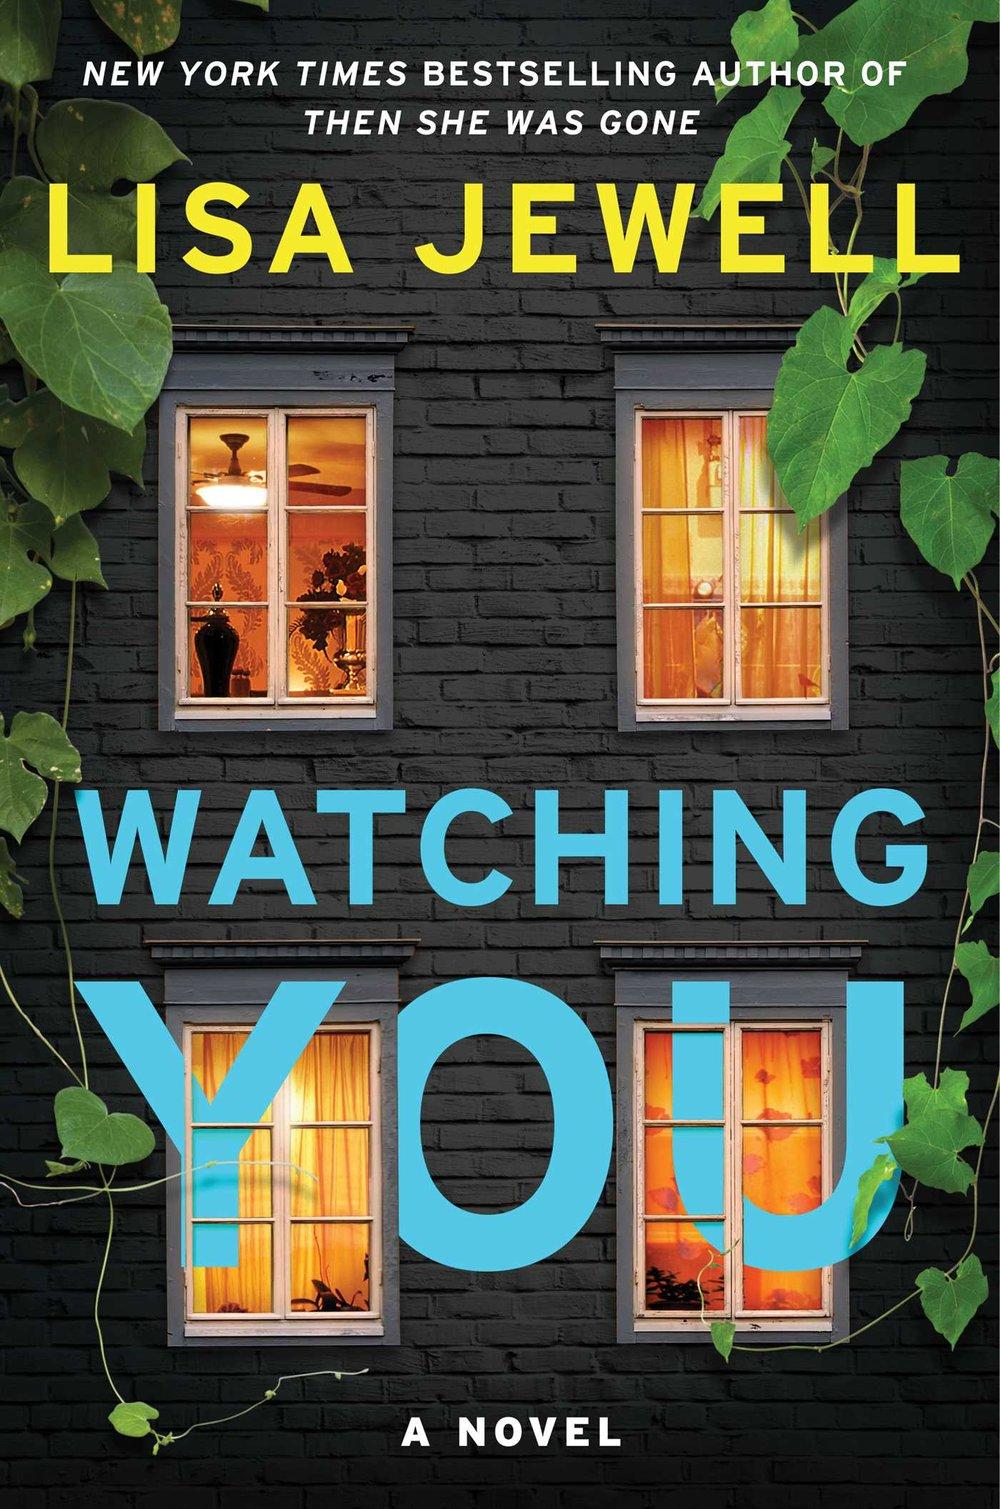 watching you by lisa jewell.jpg